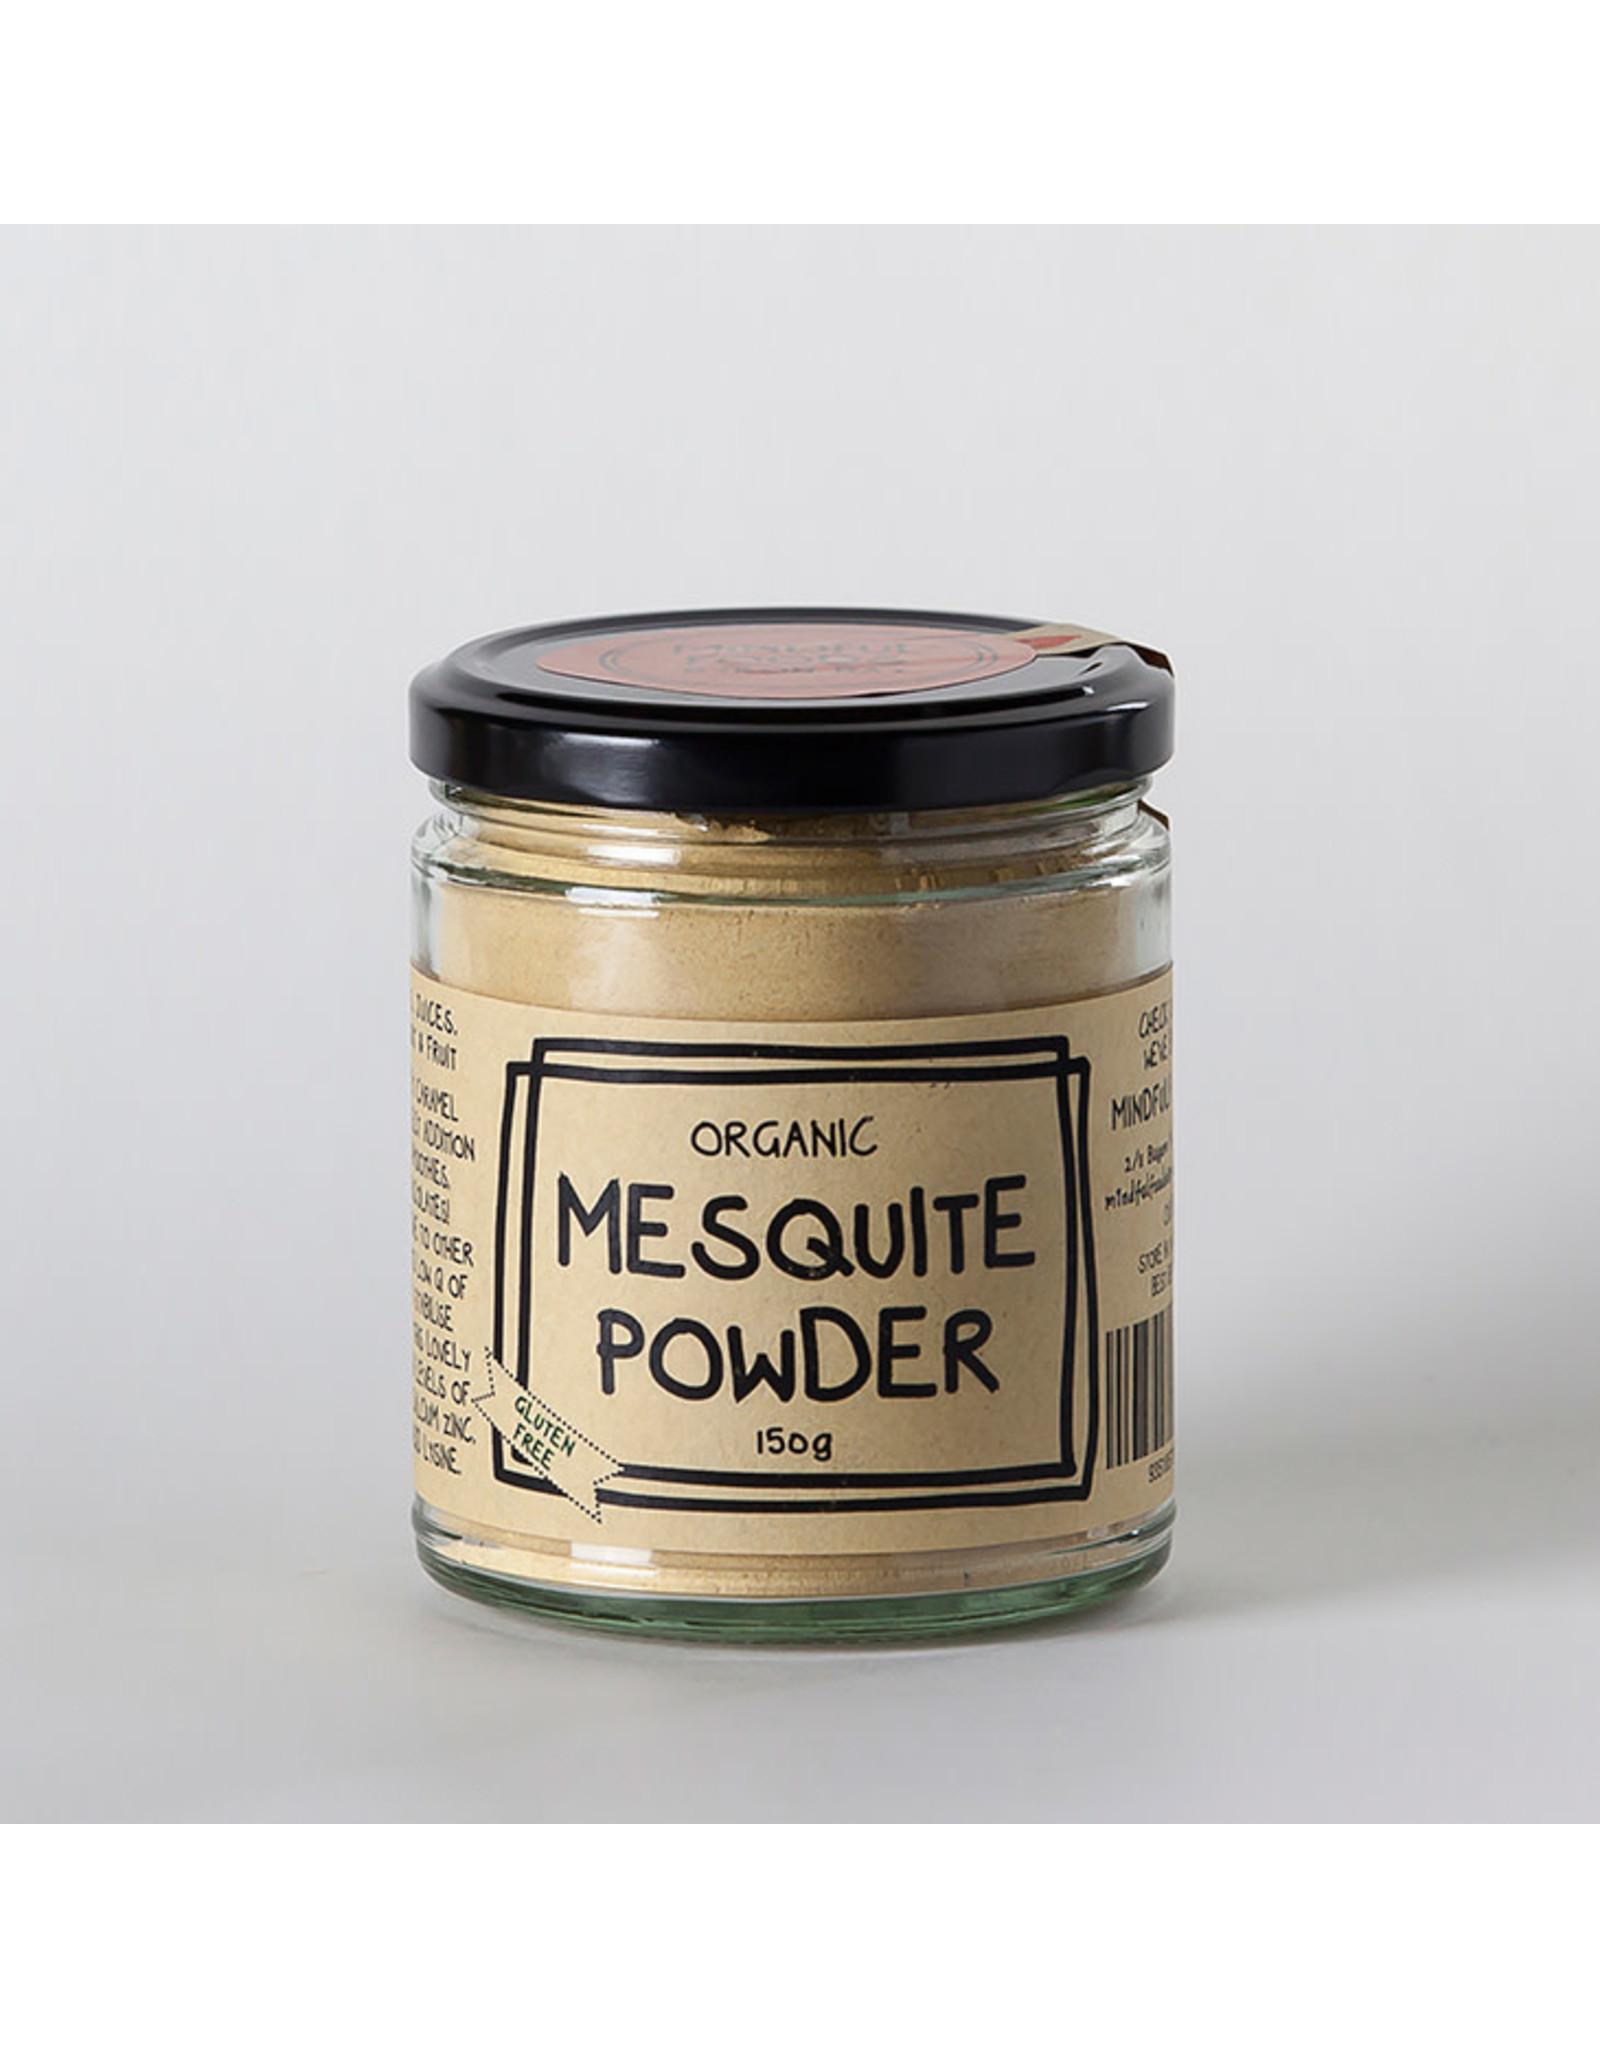 Mindful Foods Mesquite Powder - Organic